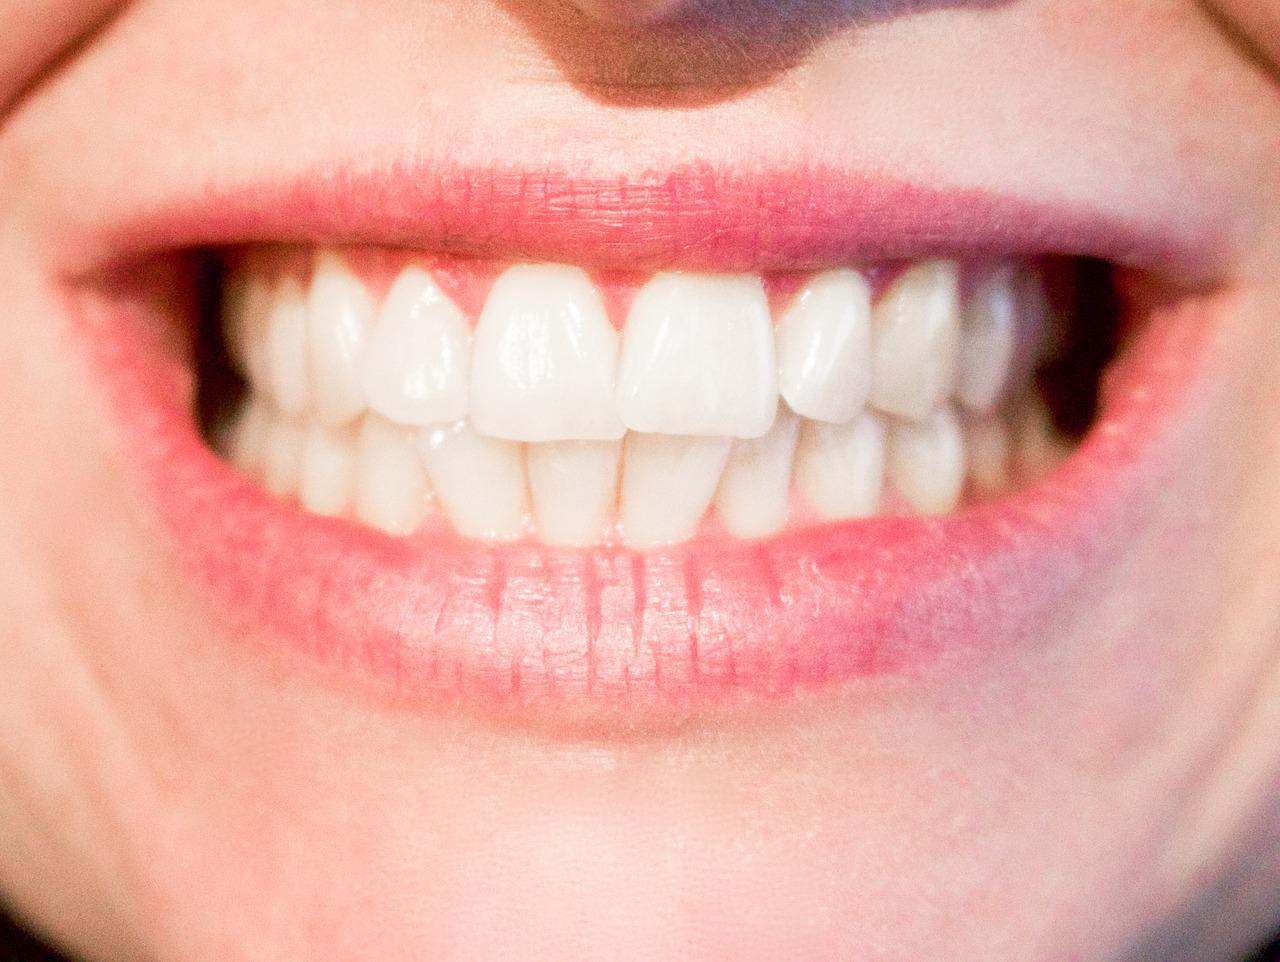 stomatoloska ordinacija